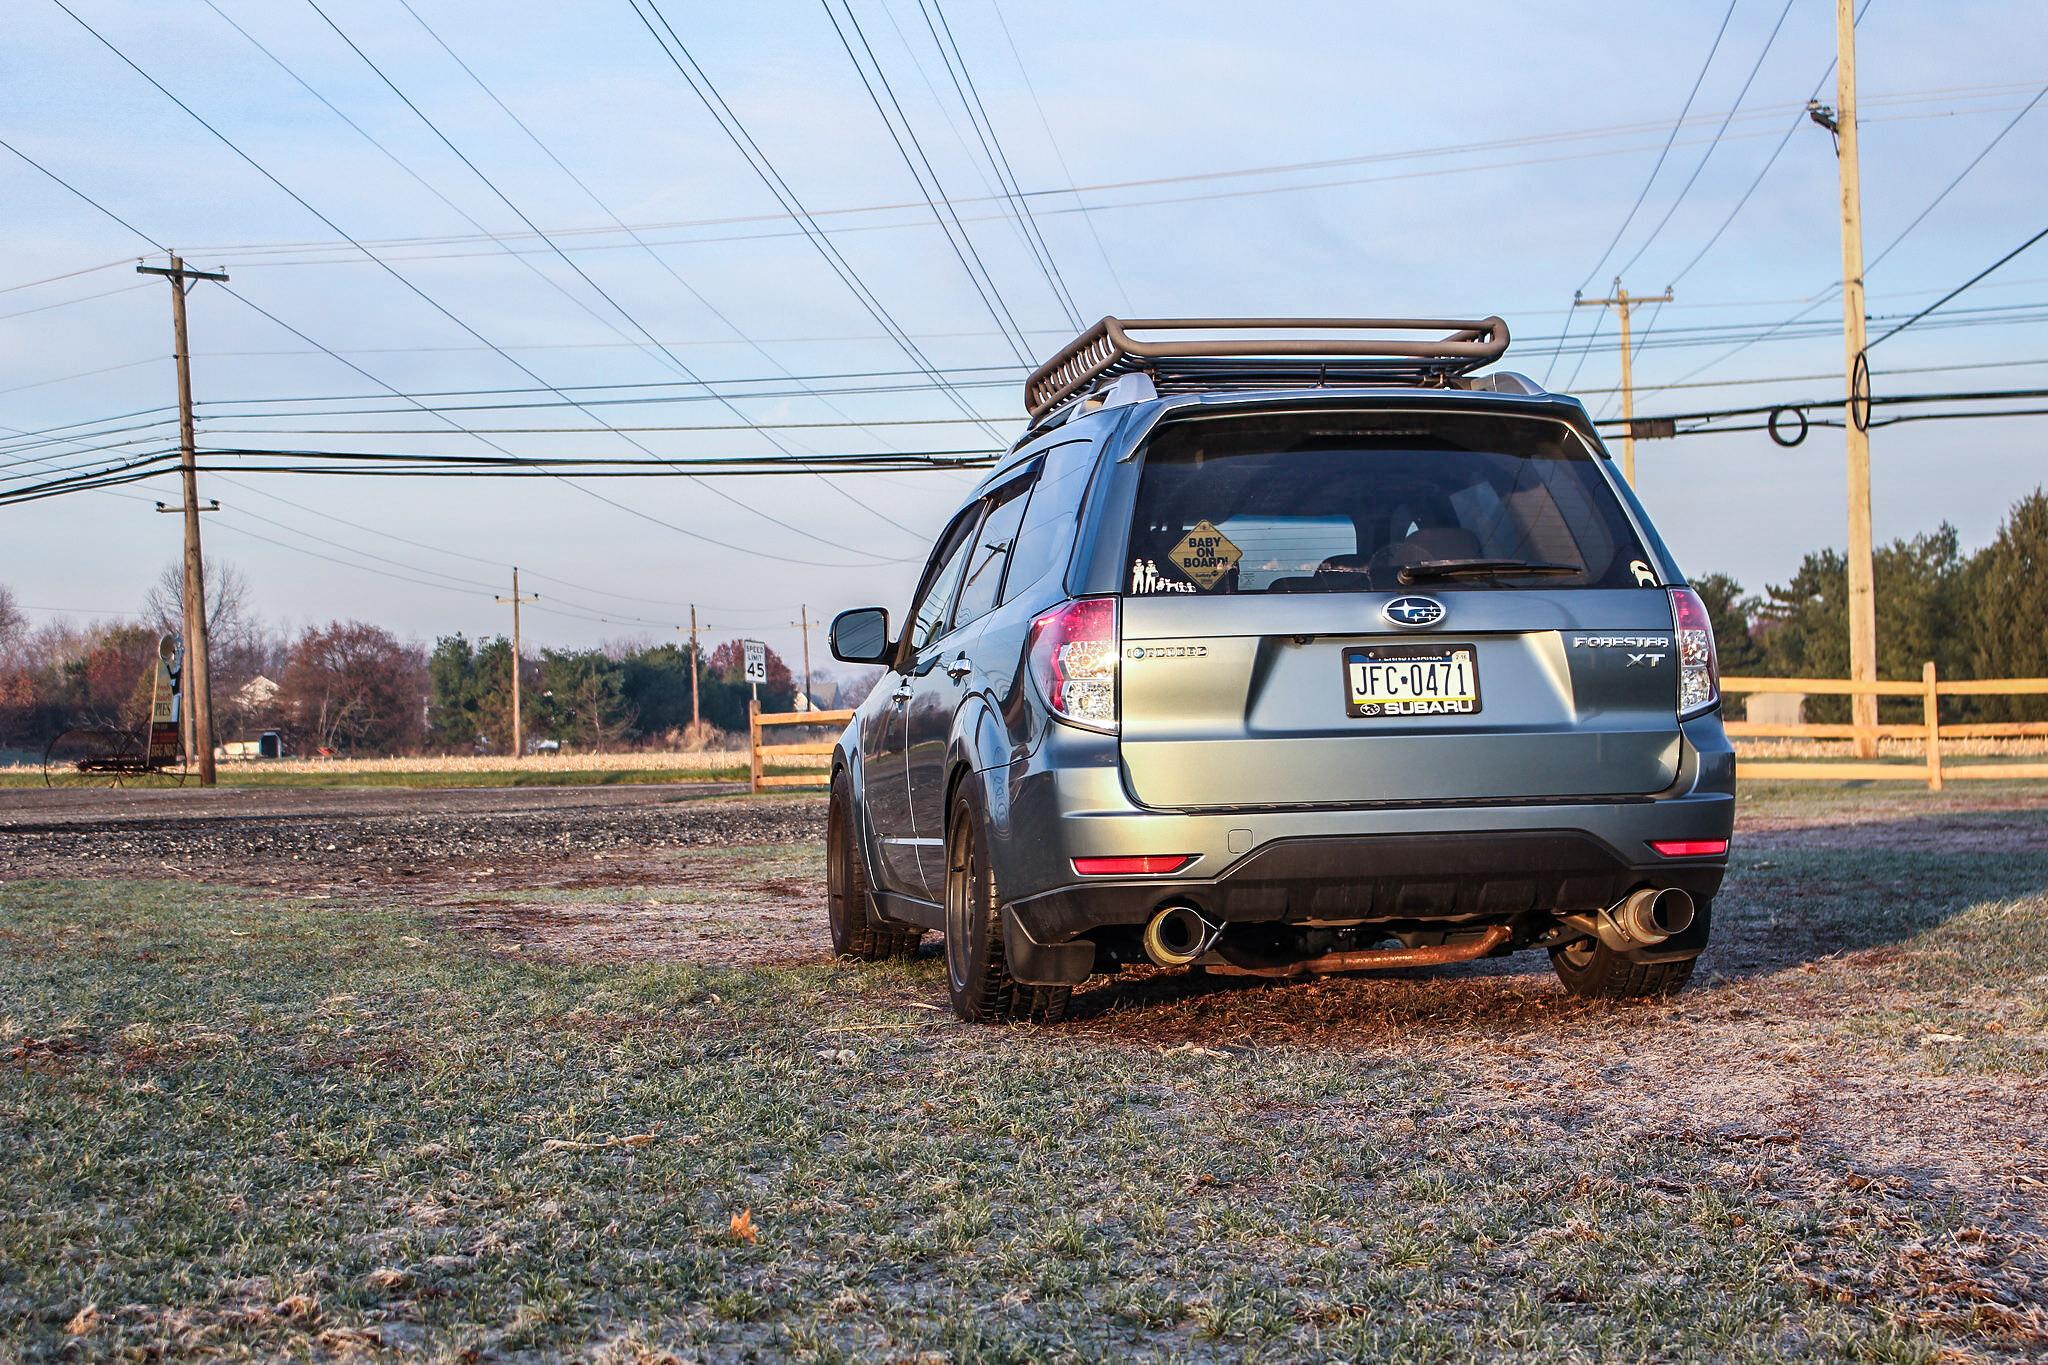 Miata Tire Size Calculator Old All New Car Release Date 2019 2020